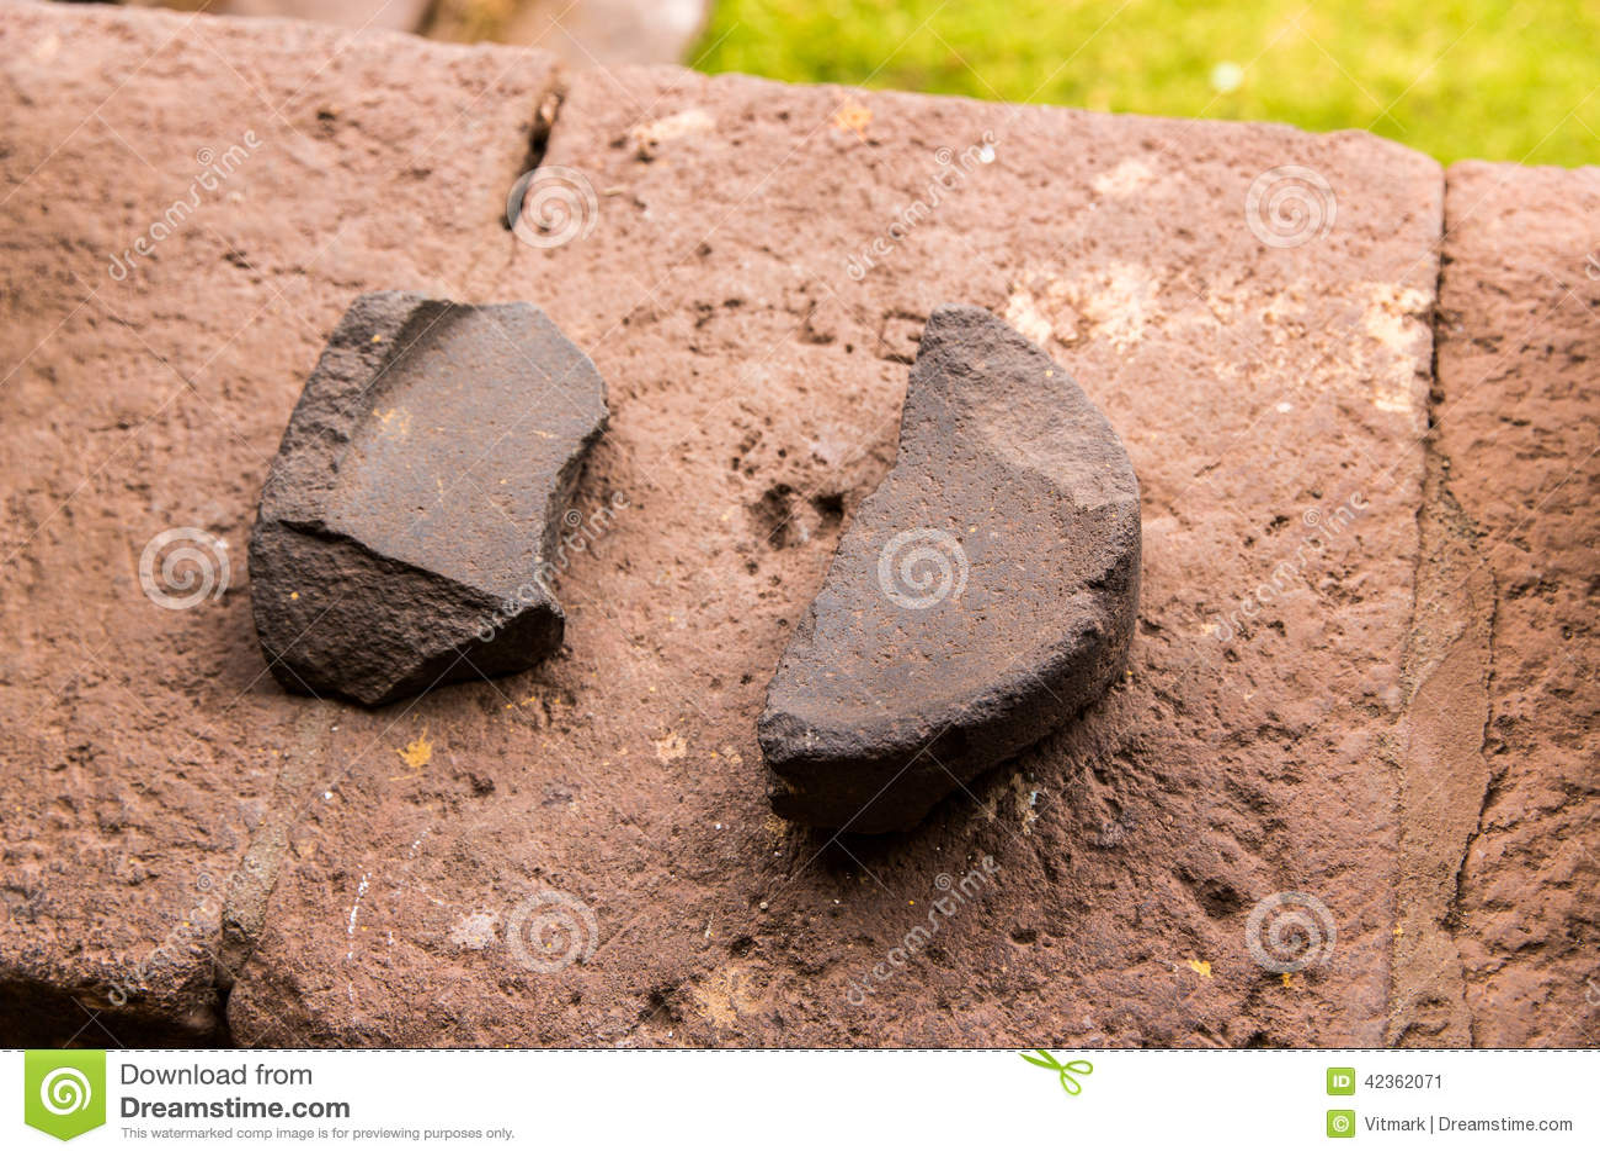 Peru ancient aztec and maya stone sculptures stock